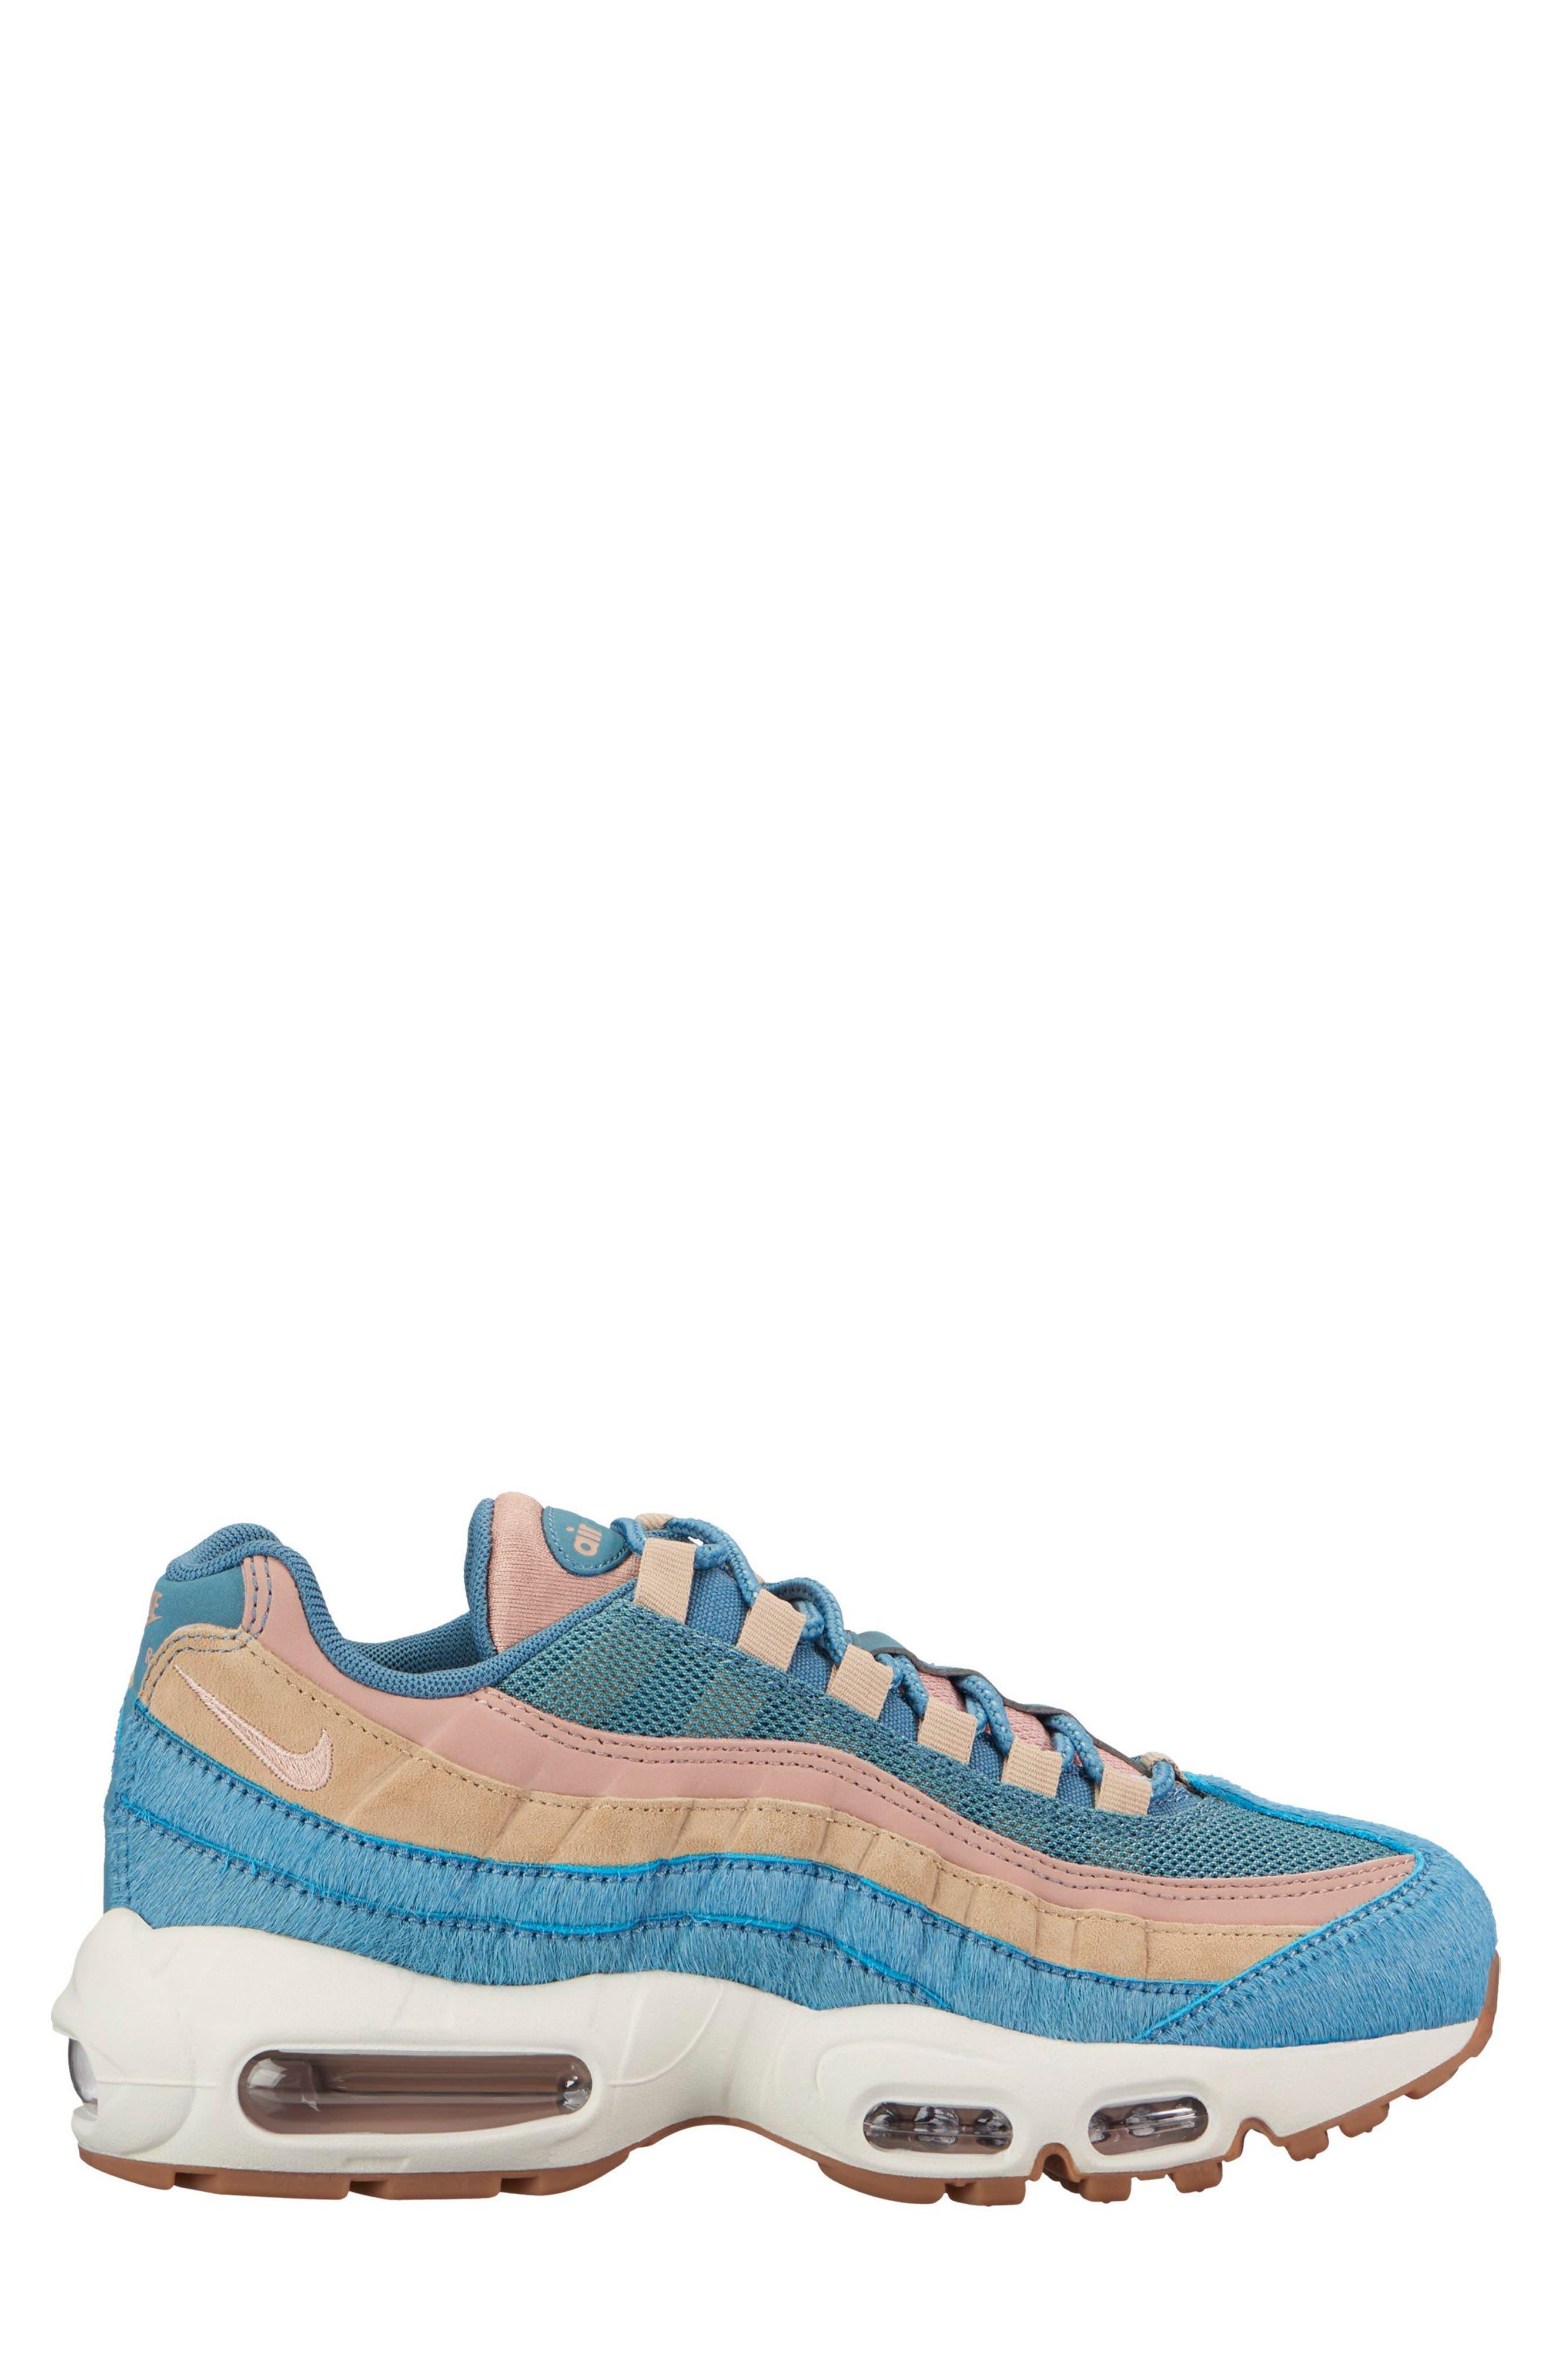 Nike Air Max 95 LX Shoe (Women)